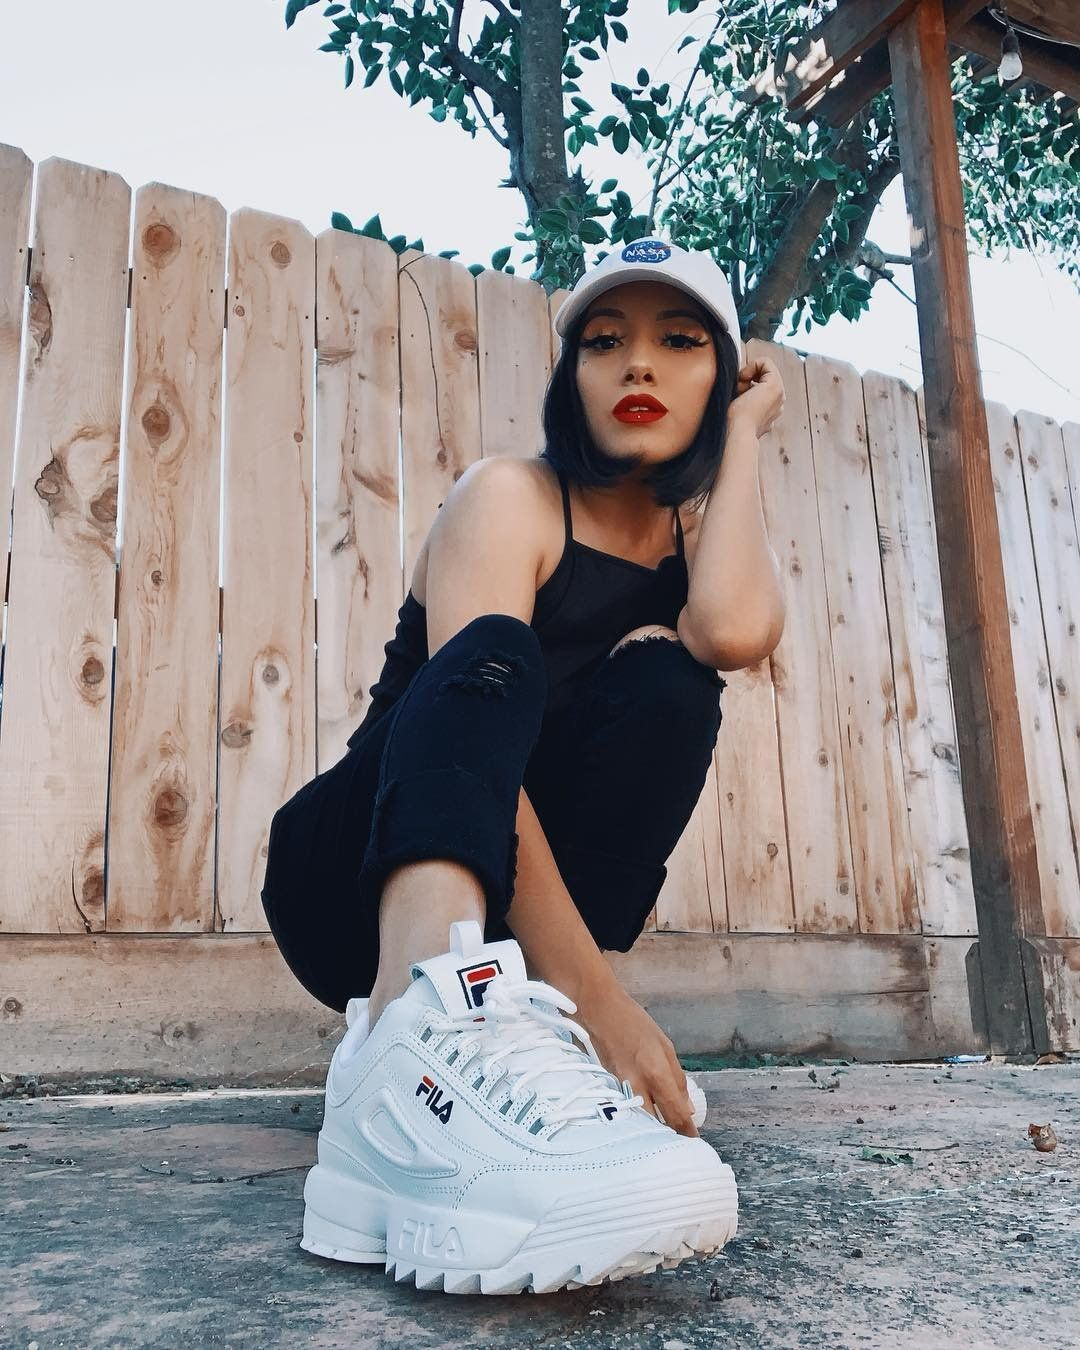 tumblr #fila #disruptor #girl #cute #outfit #black #white